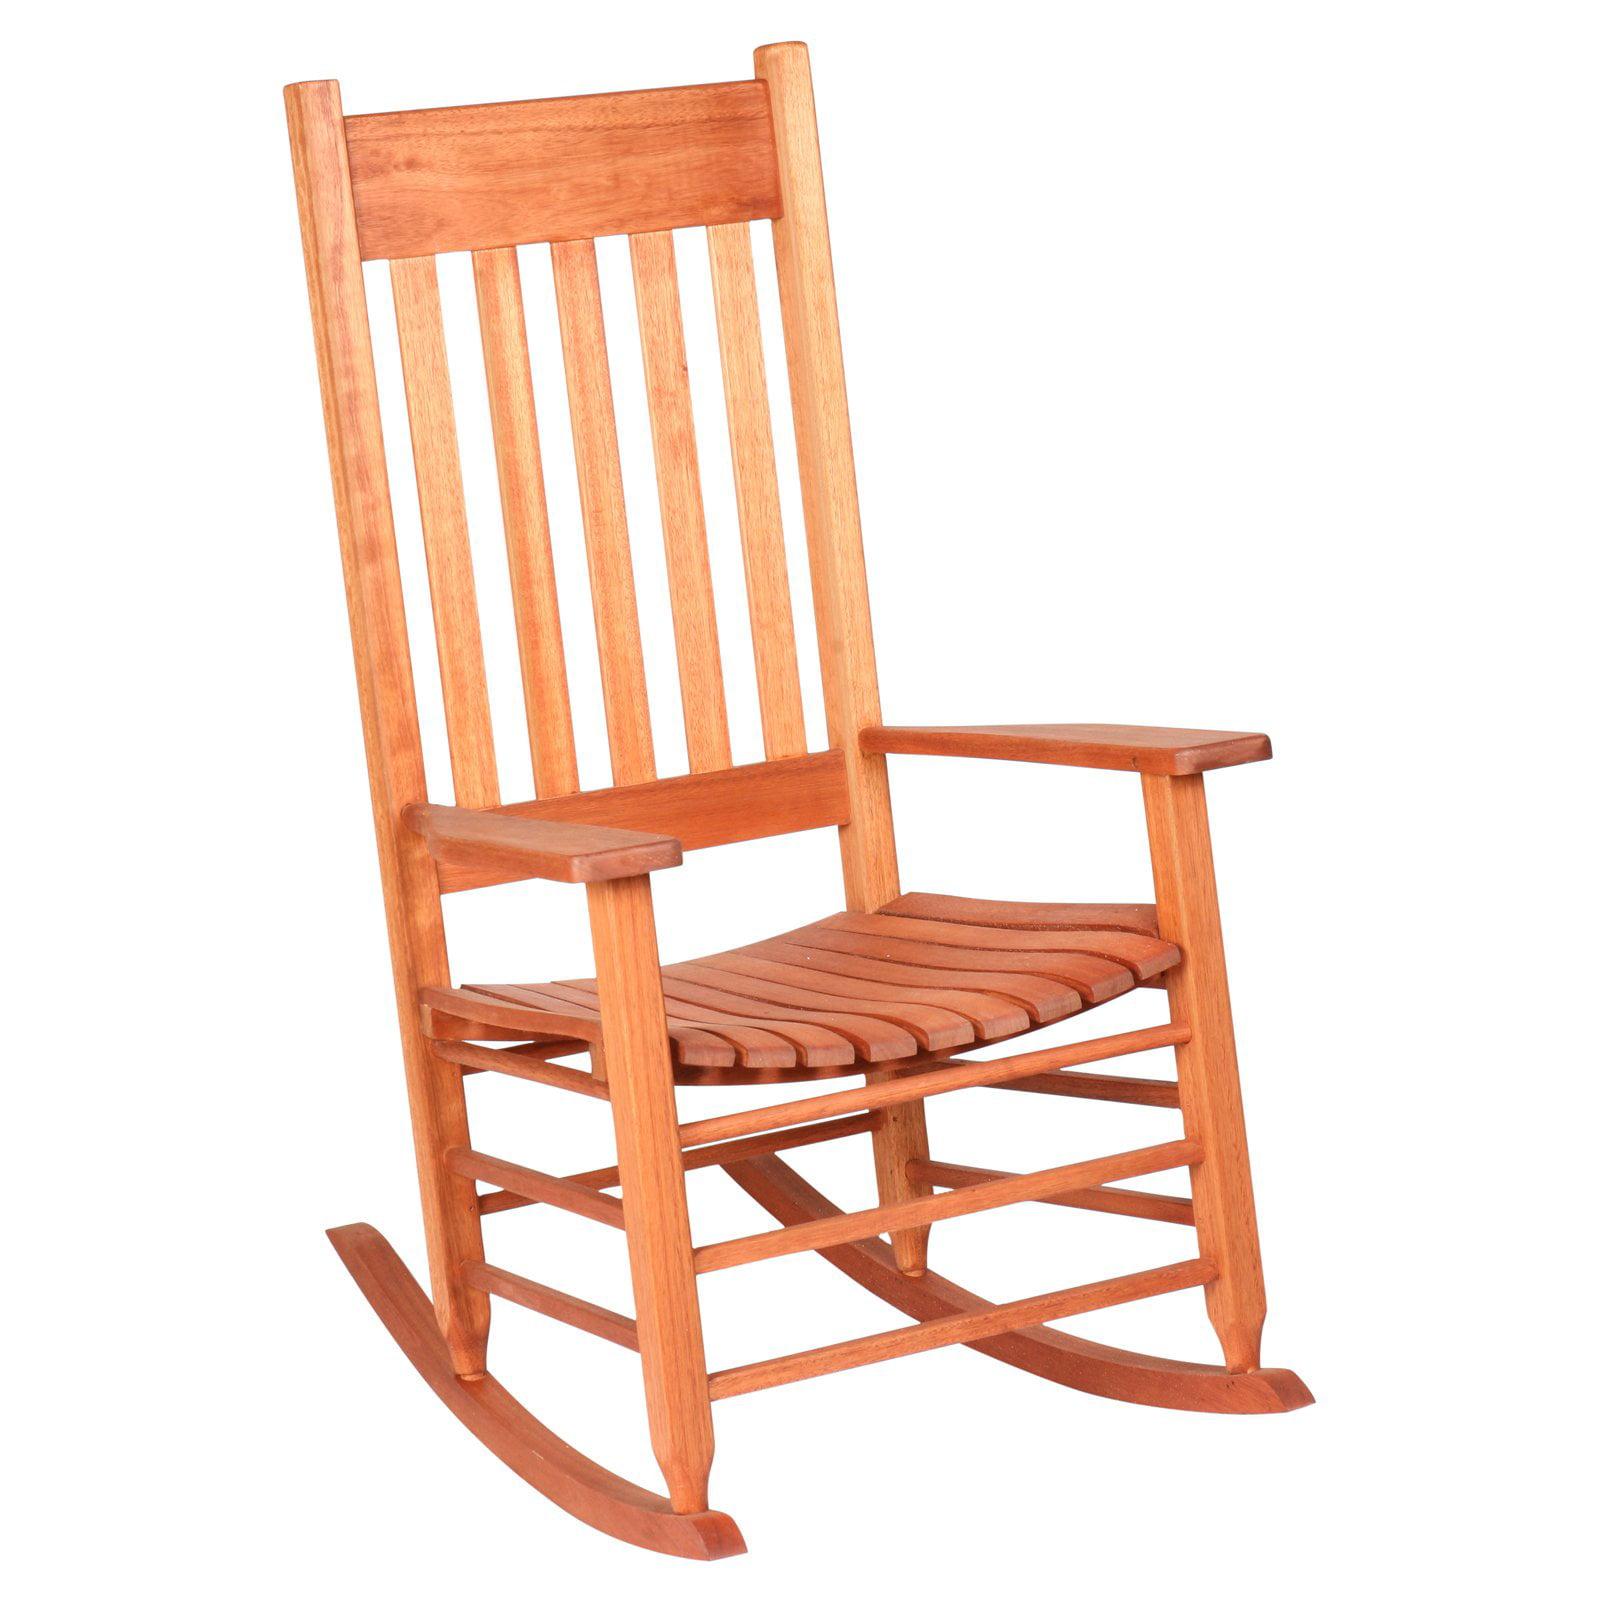 Genial Hinkle Chair Company Red Grandis Straight Back Rocking Chair   Walmart.com